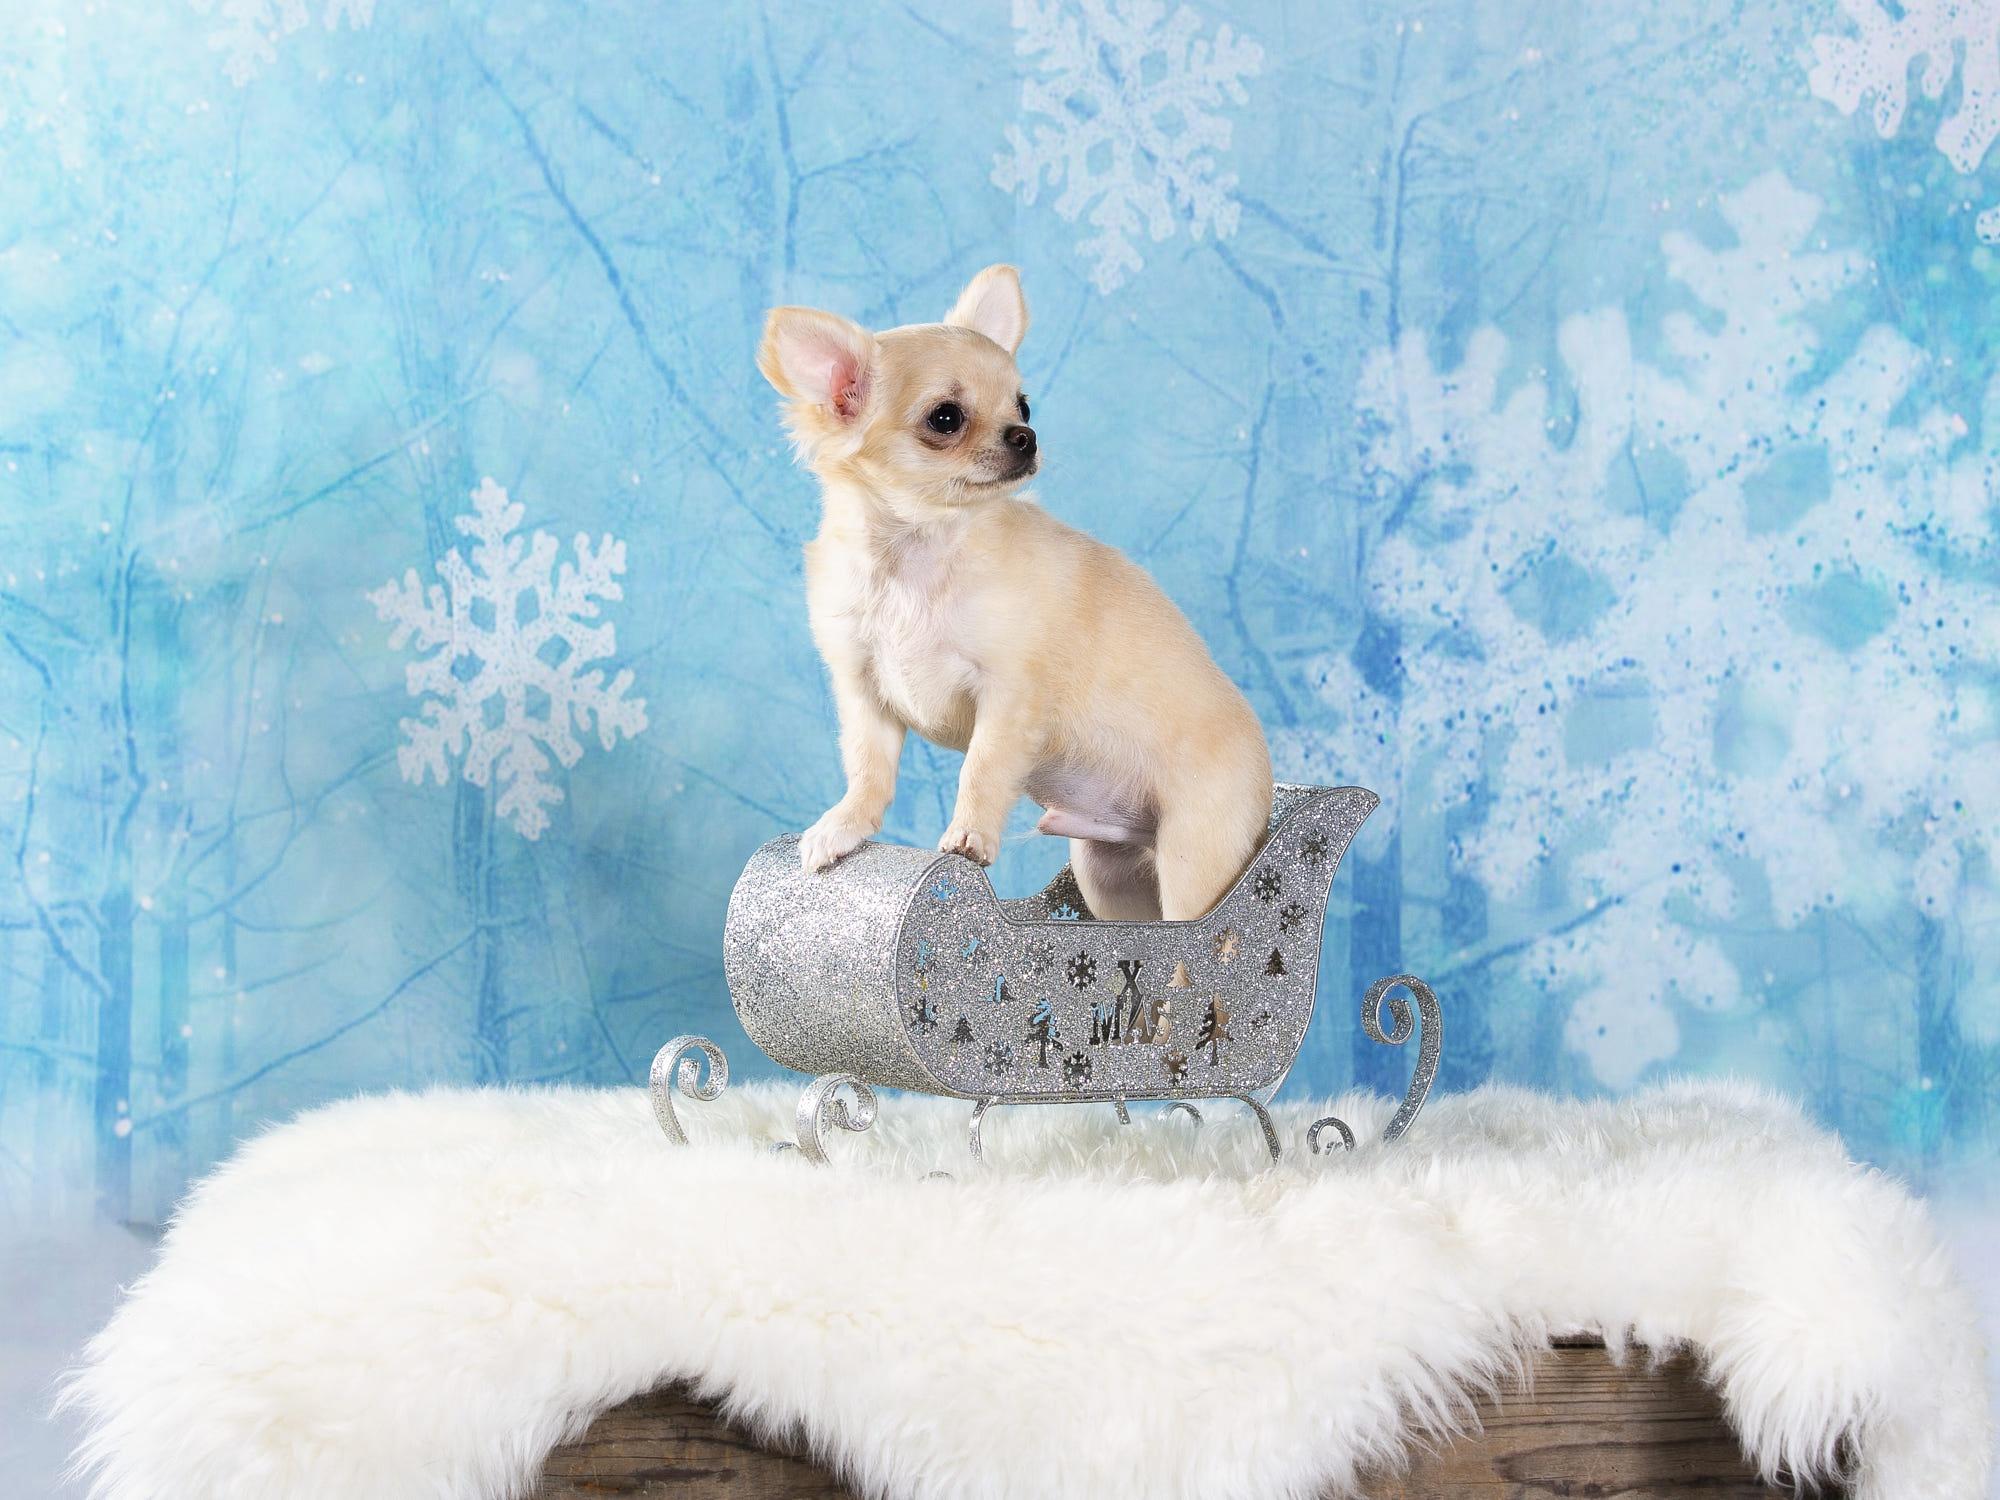 Dog Baby Animal Christmas Ornaments Puppy Pet 2000x1500